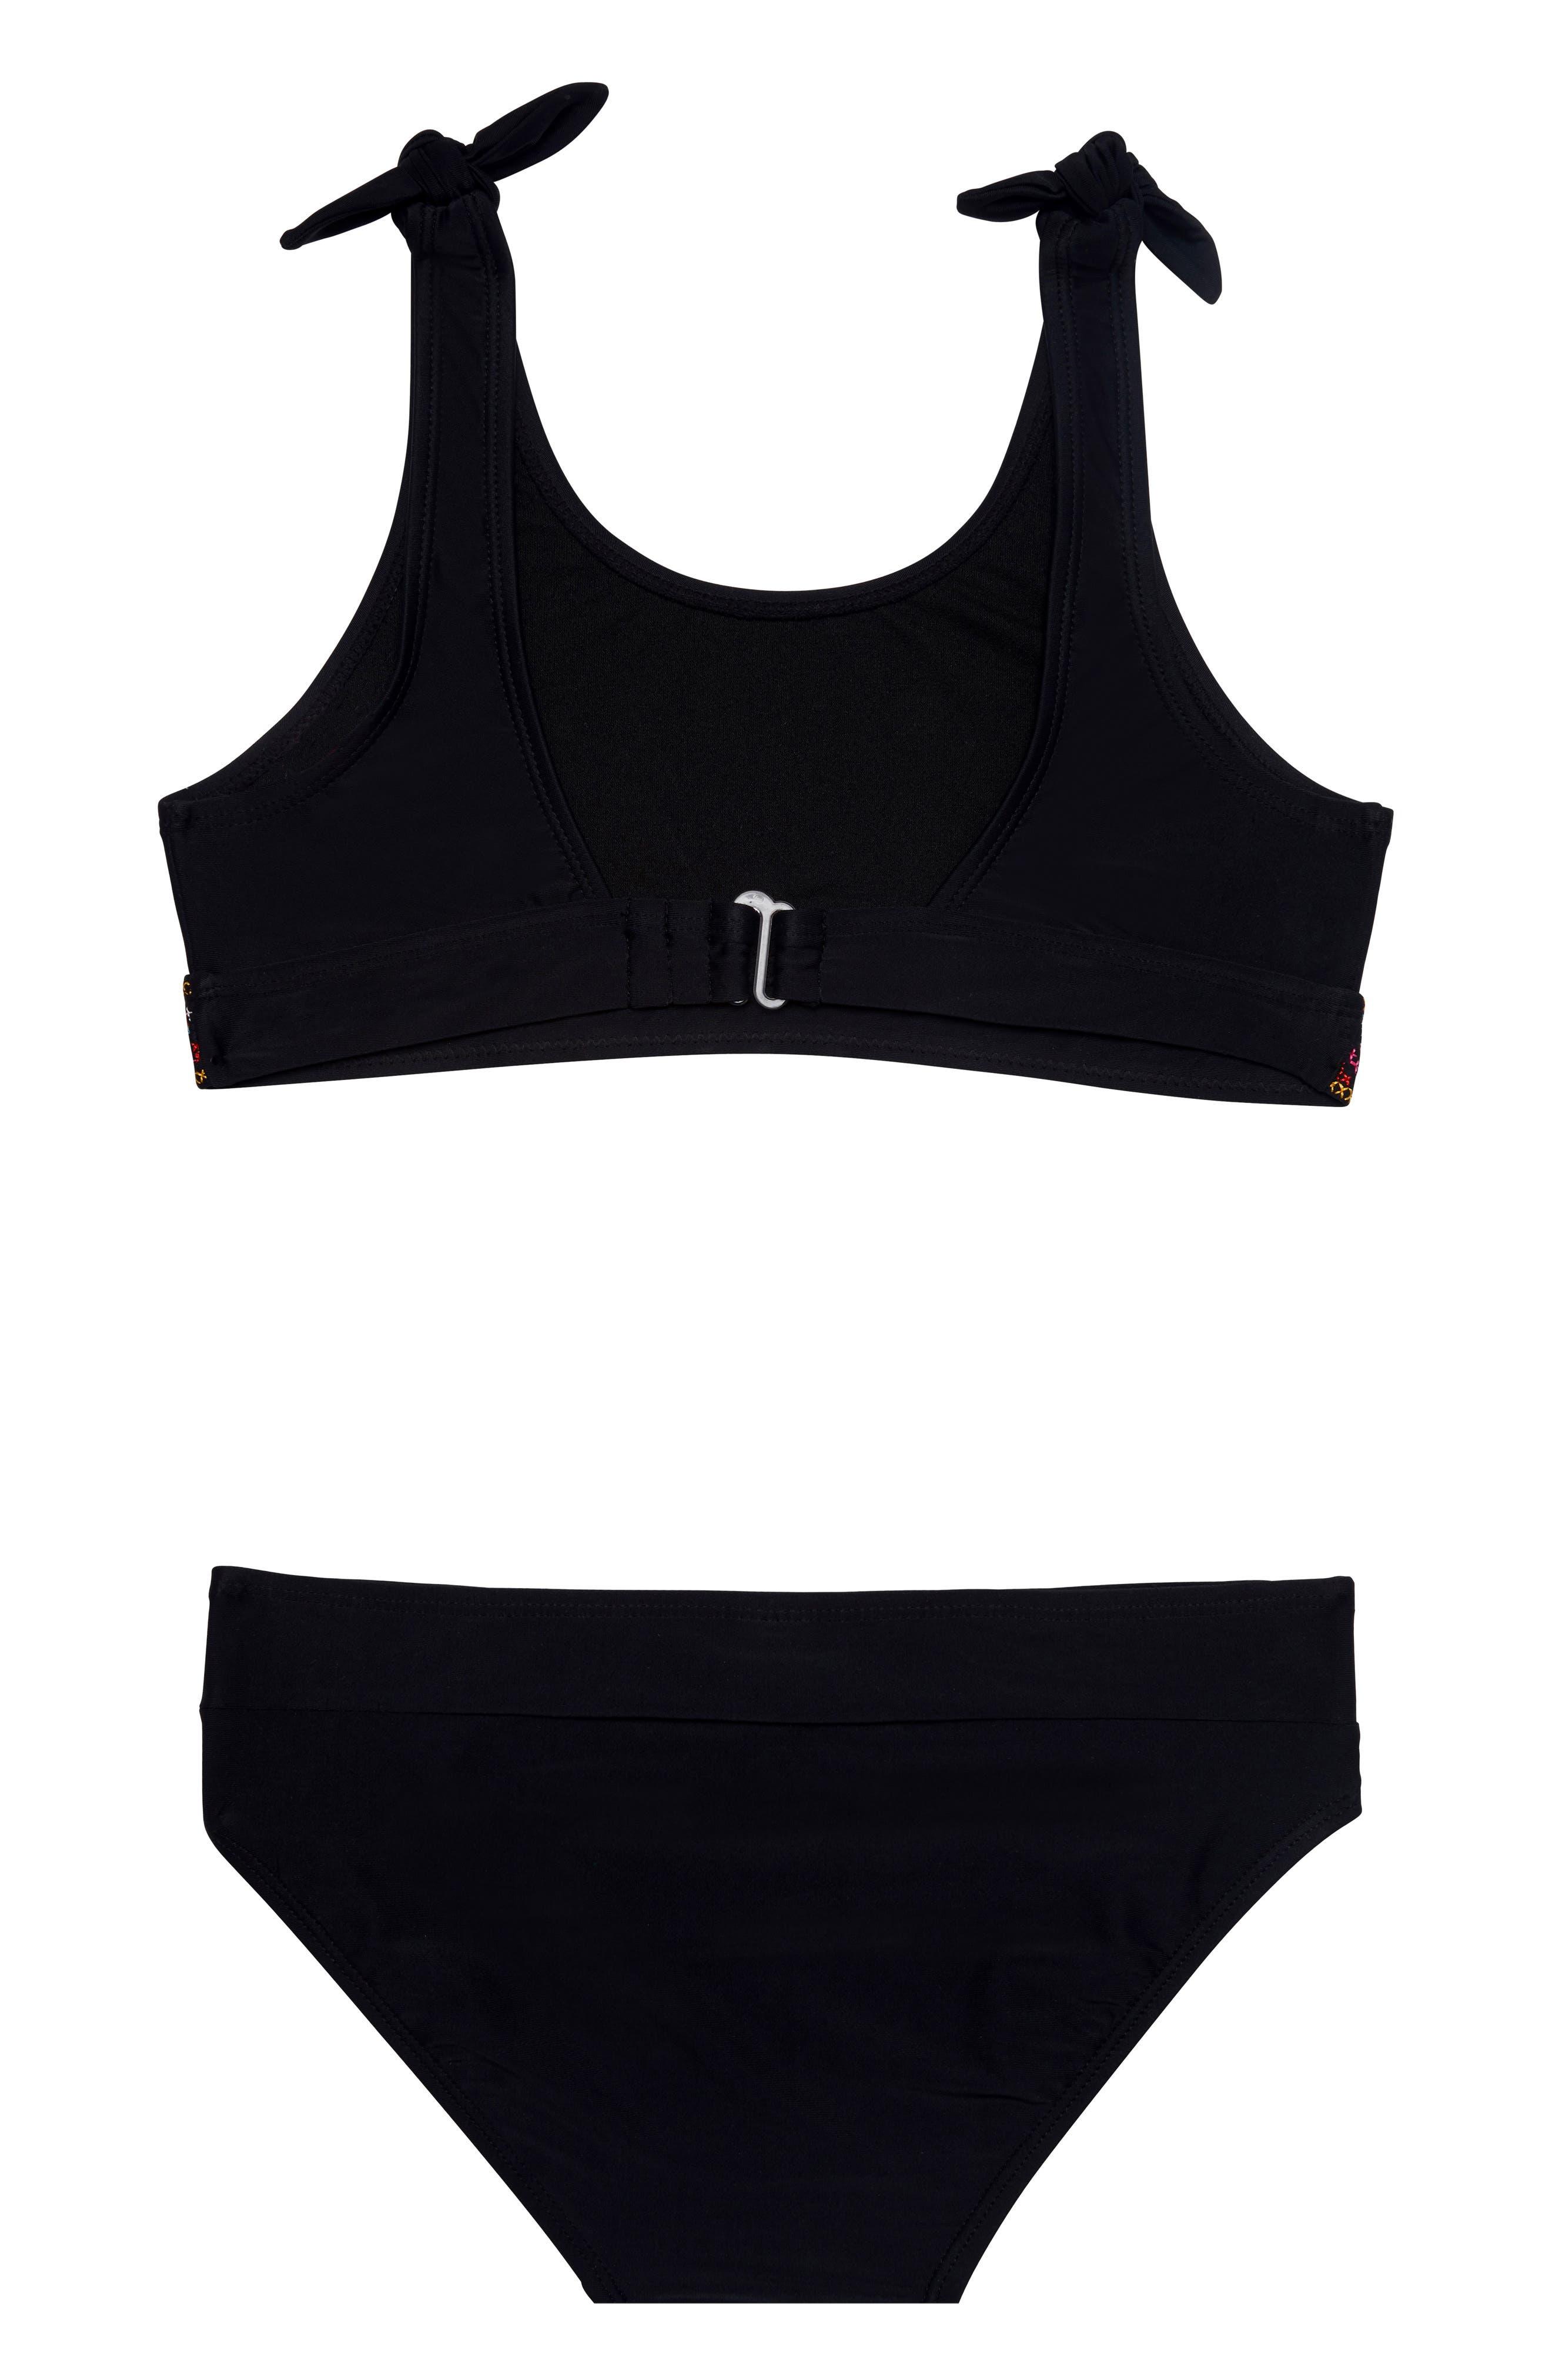 GOSSIP GIRL, Mini Cross Road Two-Piece Swimsuit, Alternate thumbnail 2, color, BLACK/ MULTI